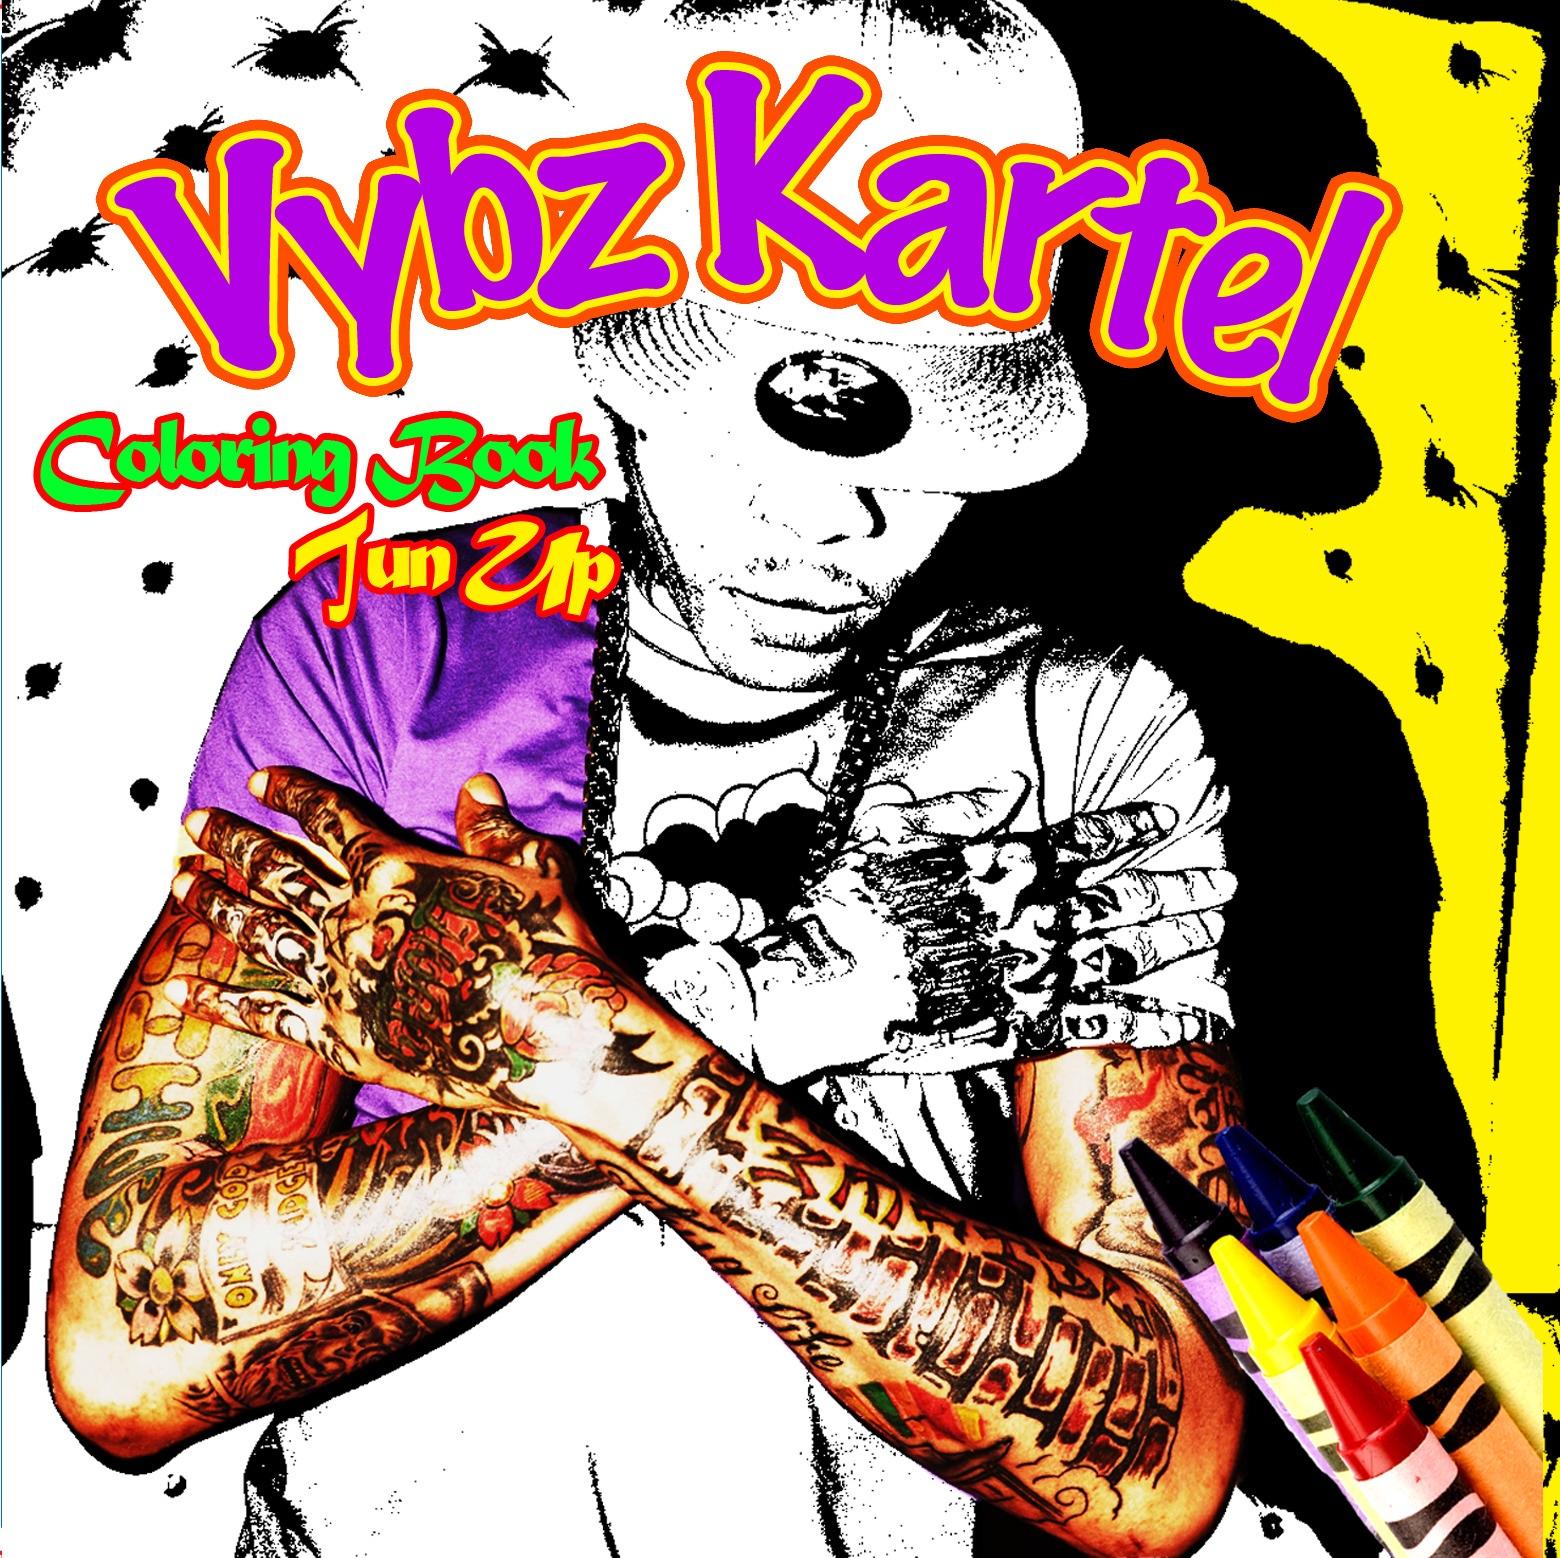 Vybz Kartel Coloring Book Tattoo Time Lyrics Vybz kartel tattoo